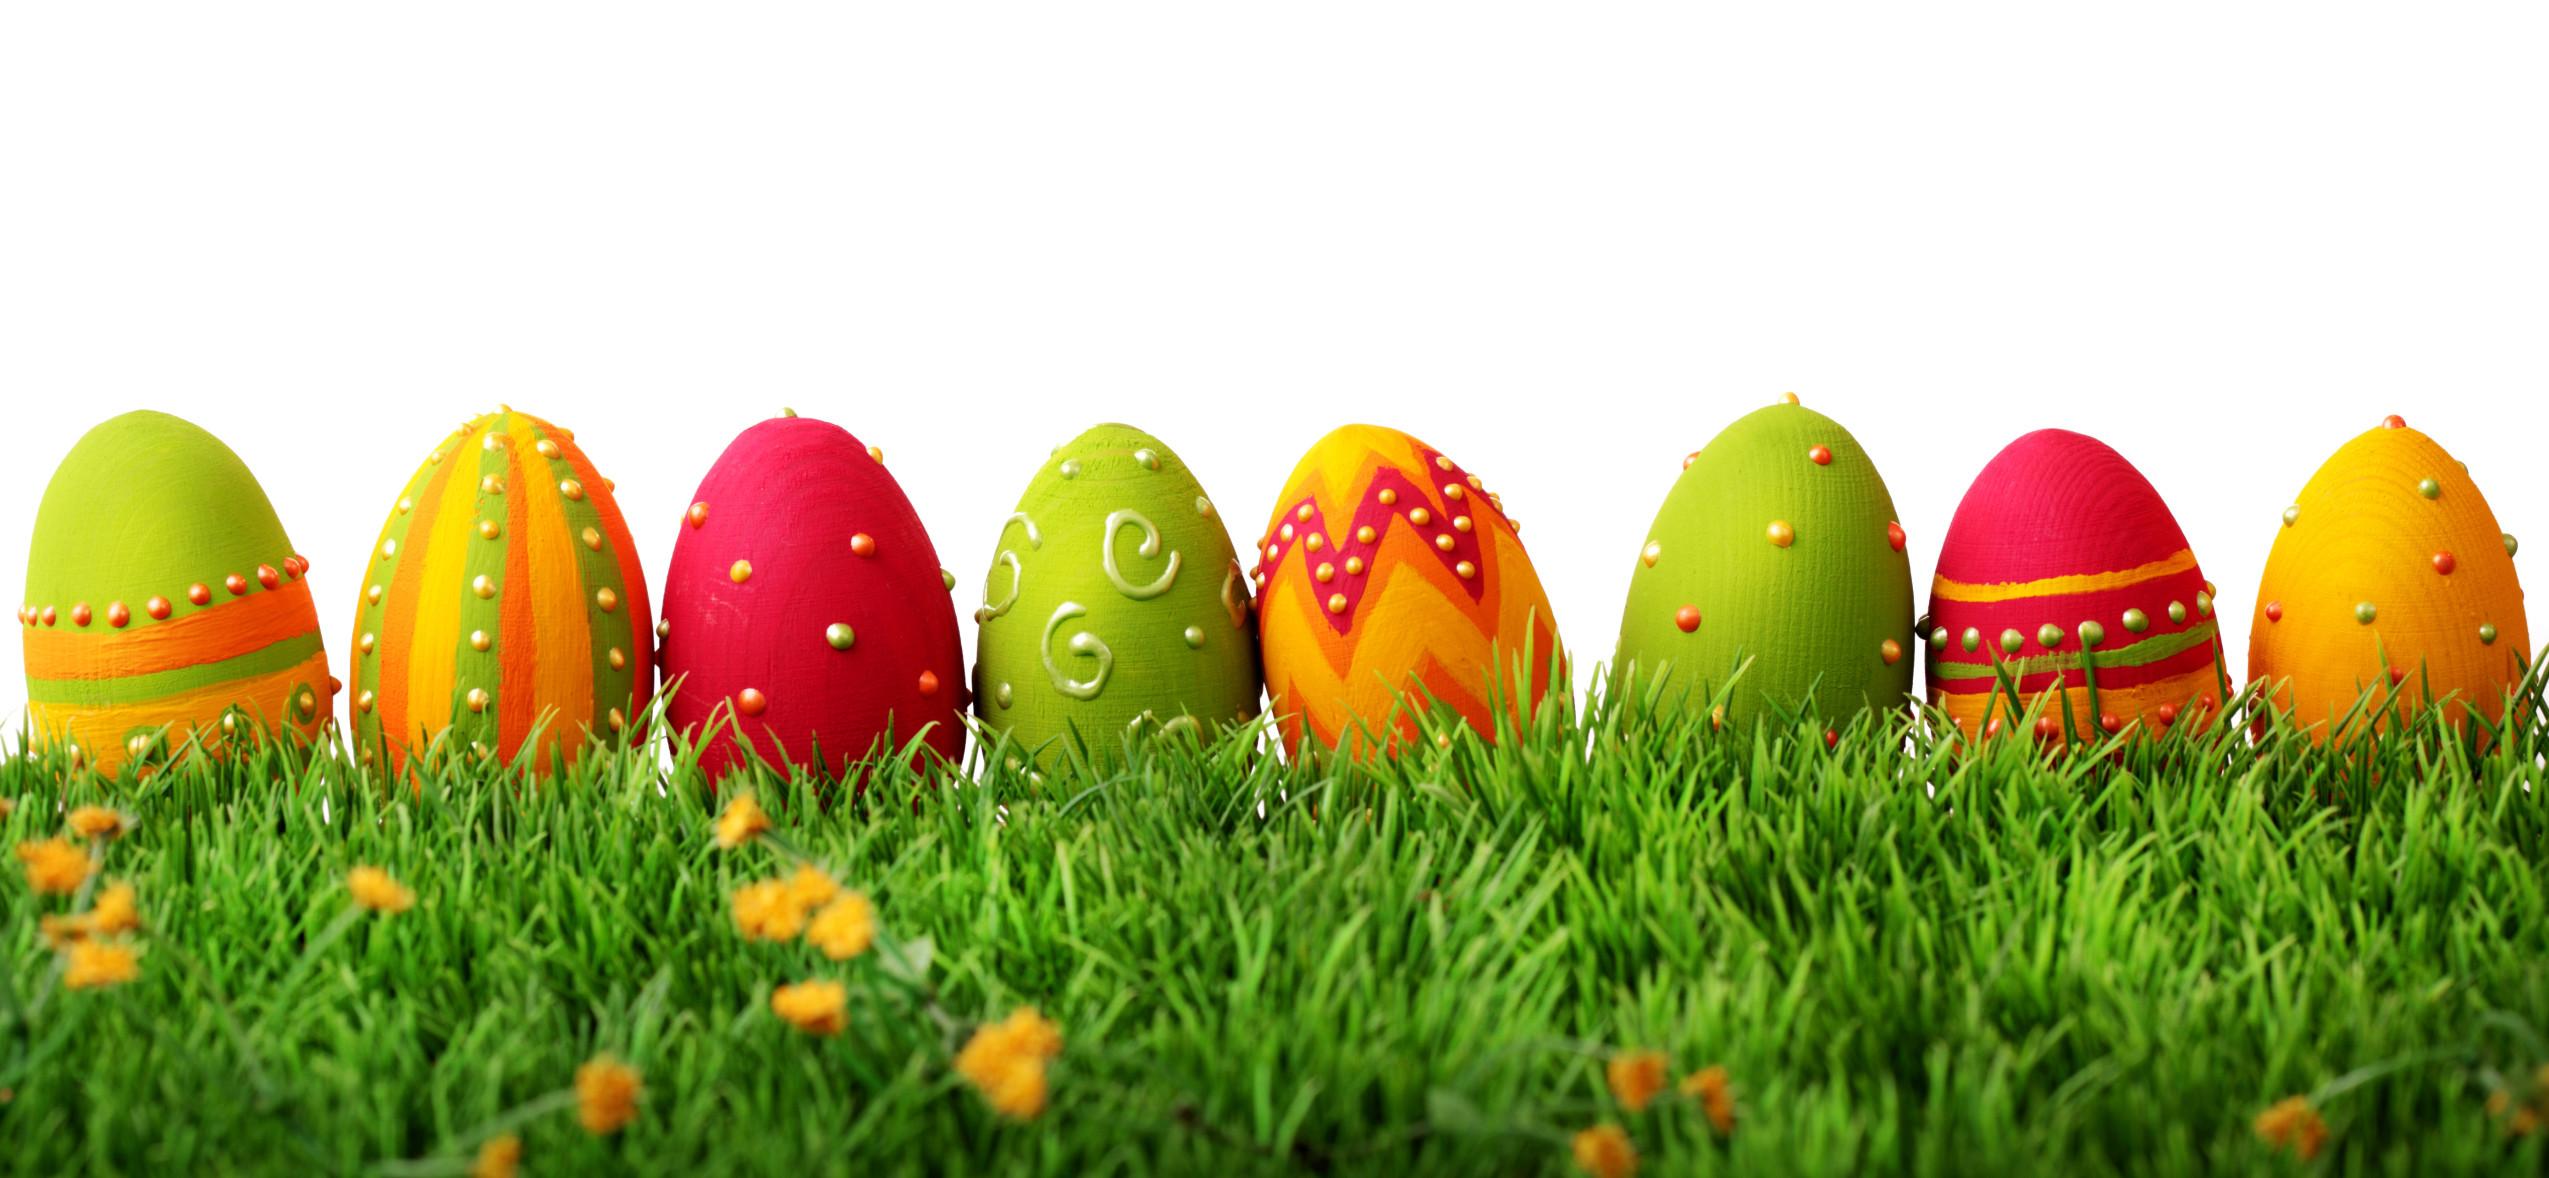 Easter Egg Backgrounds Wallpapertag